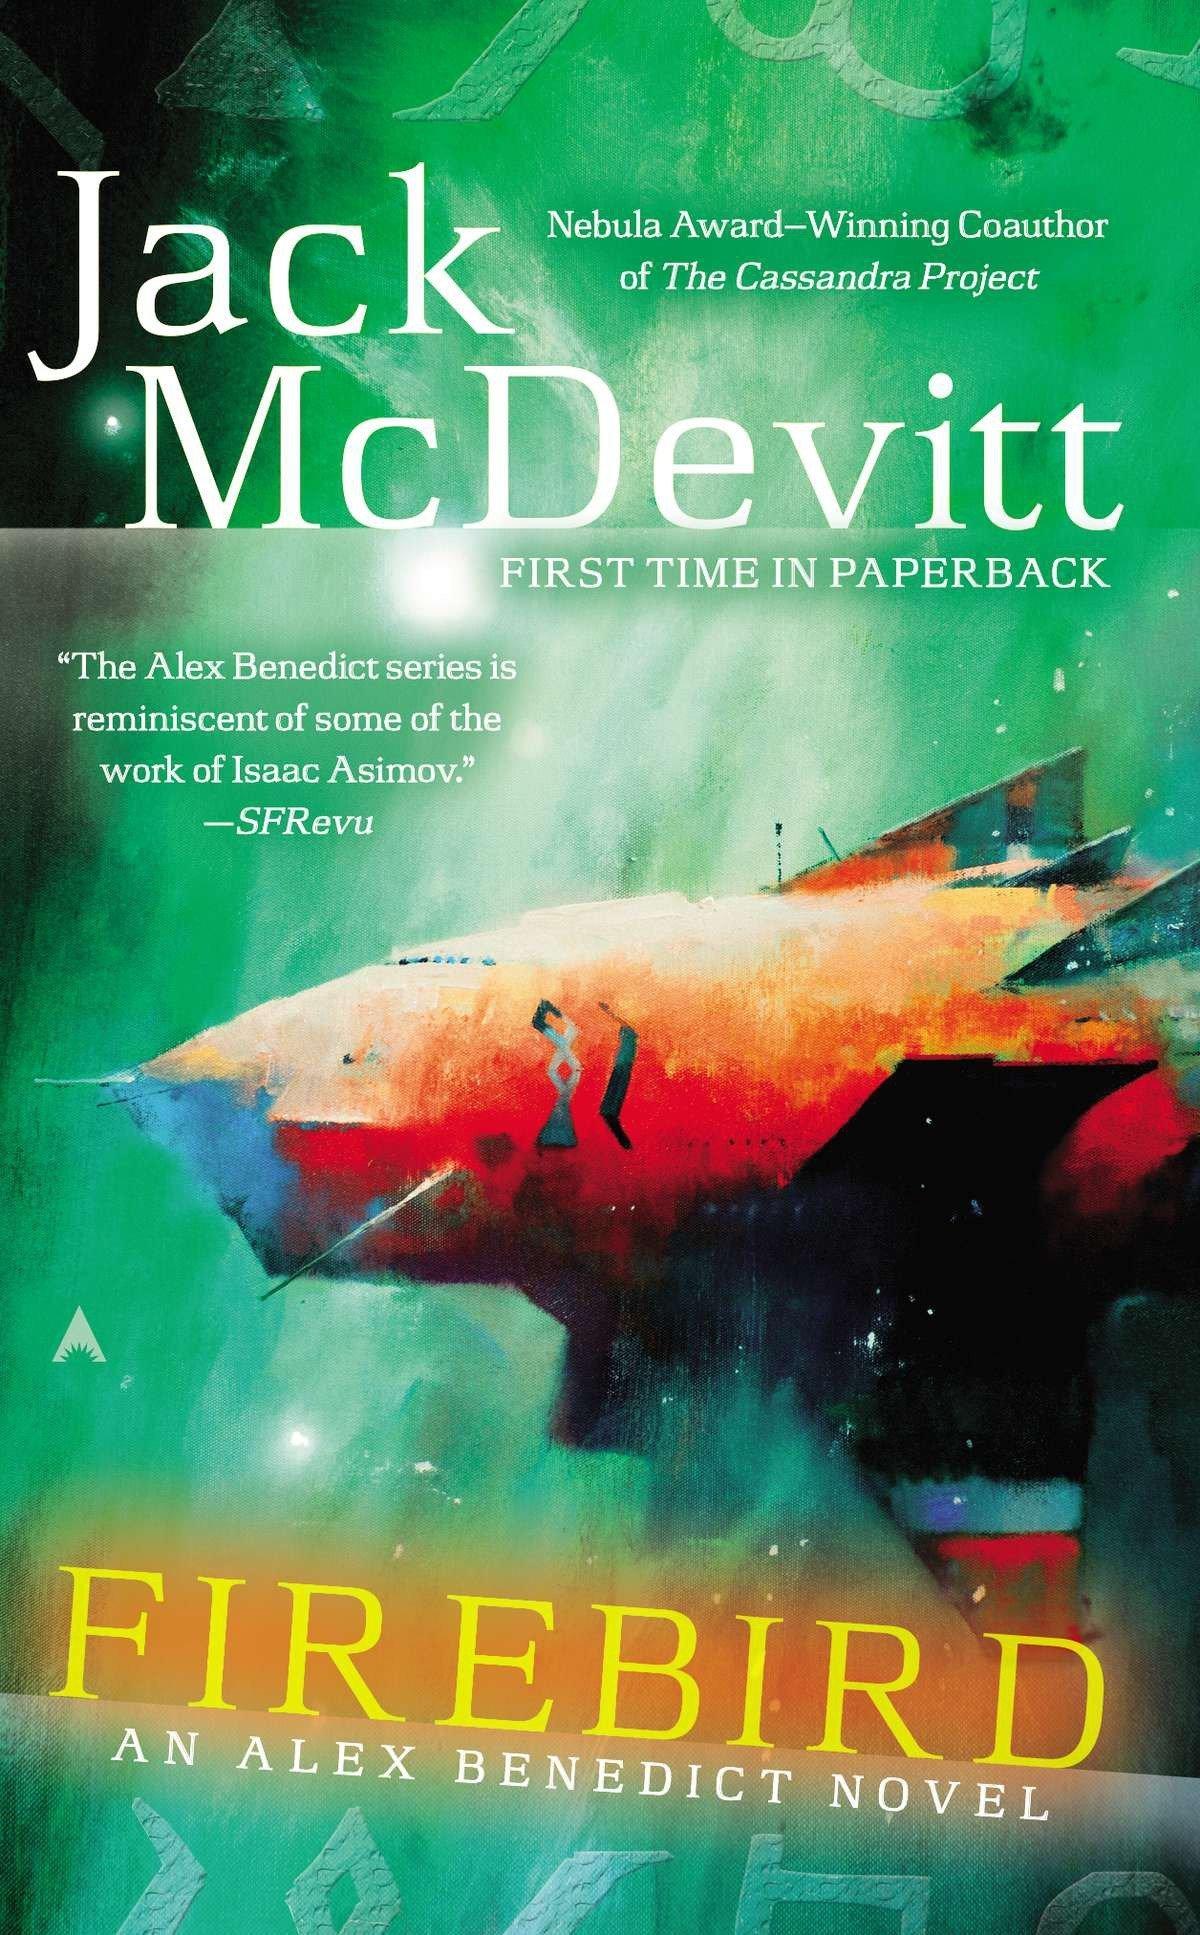 Firebird (An Alex Benedict Novel) pdf epub